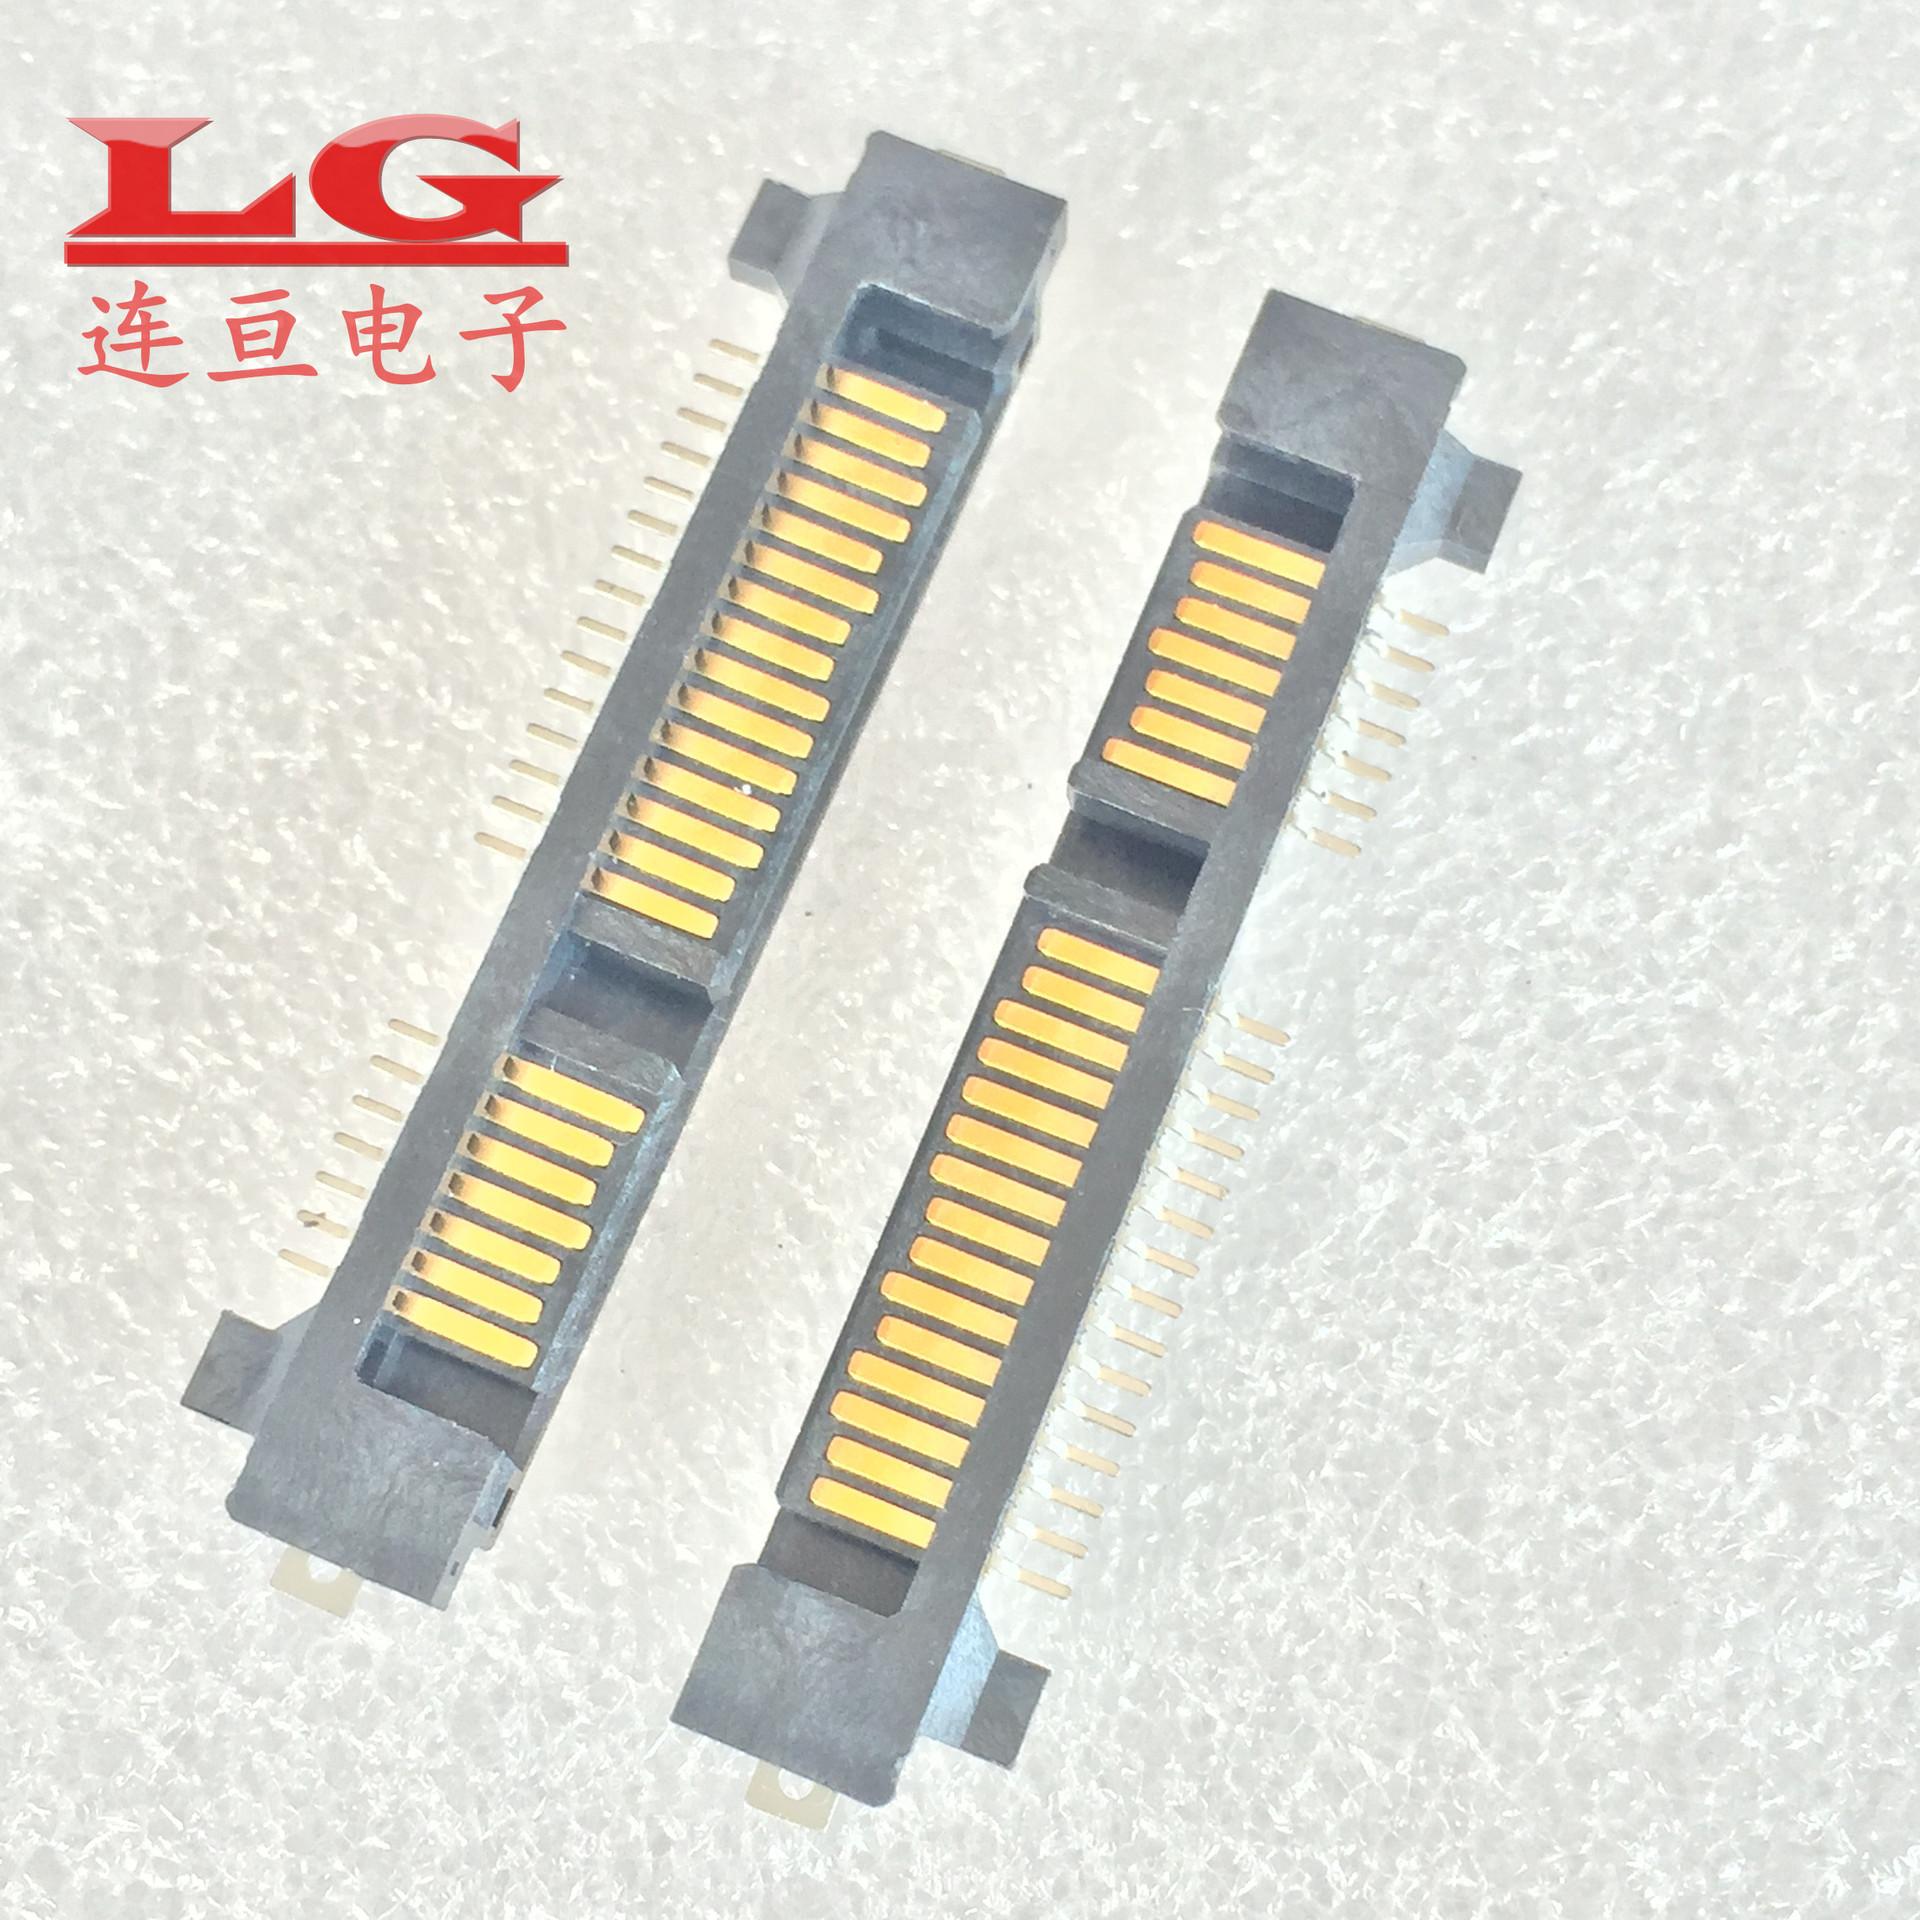 SATA硬盘接口连接器7+15P插件22pin1.0卧贴夹板90度贴片端子插座